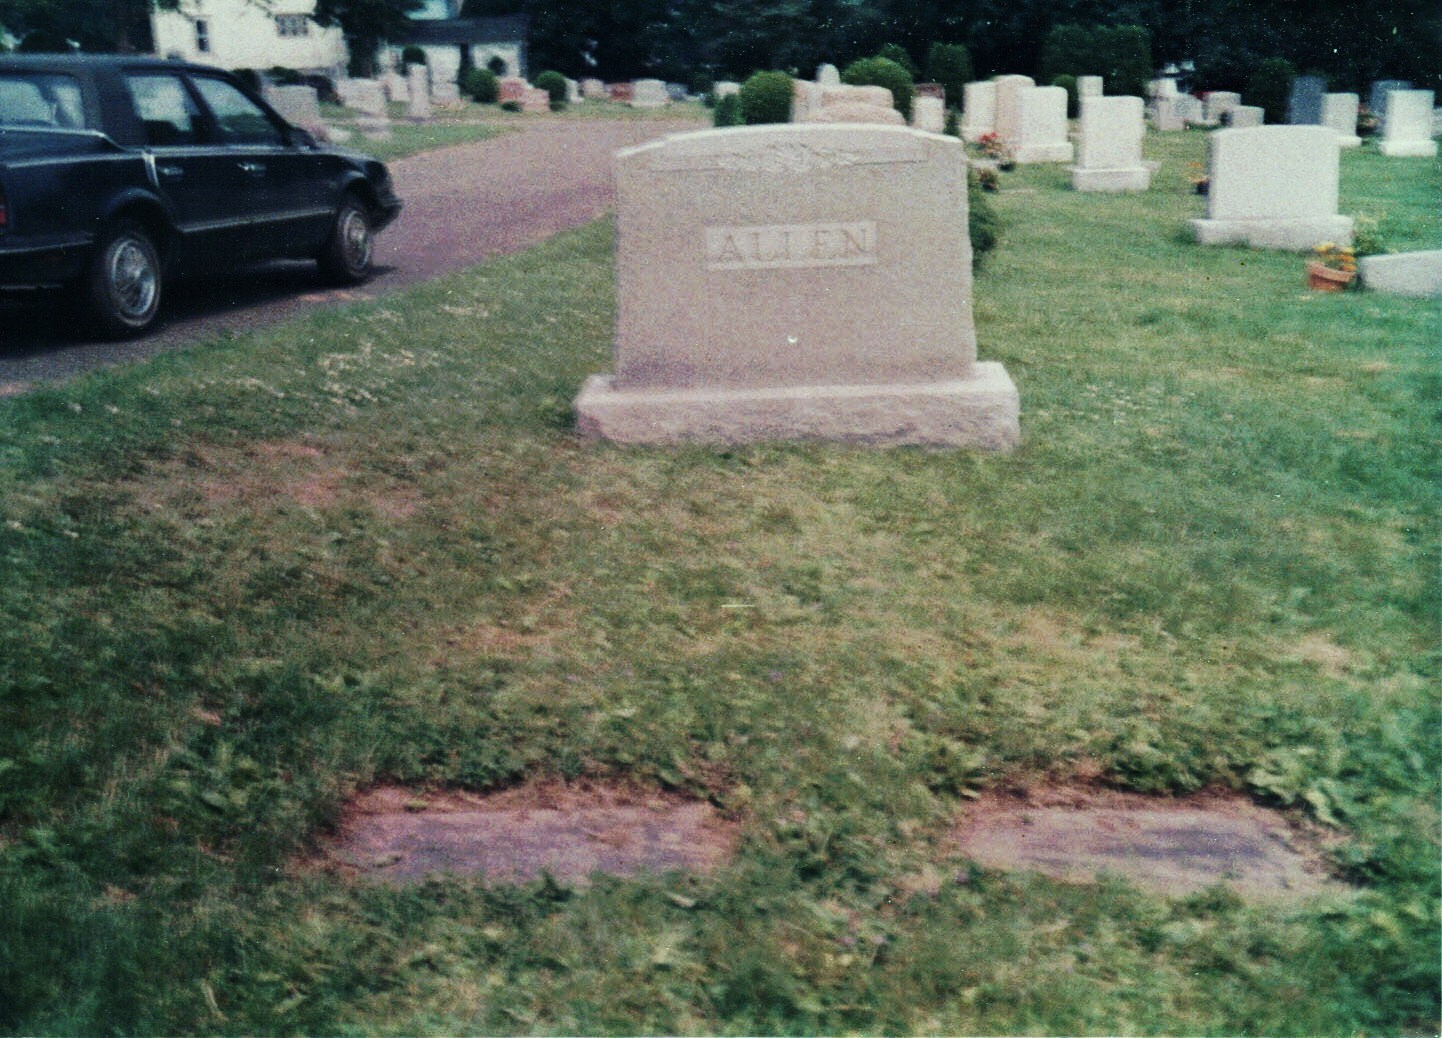 William Daniel Allen, Jr